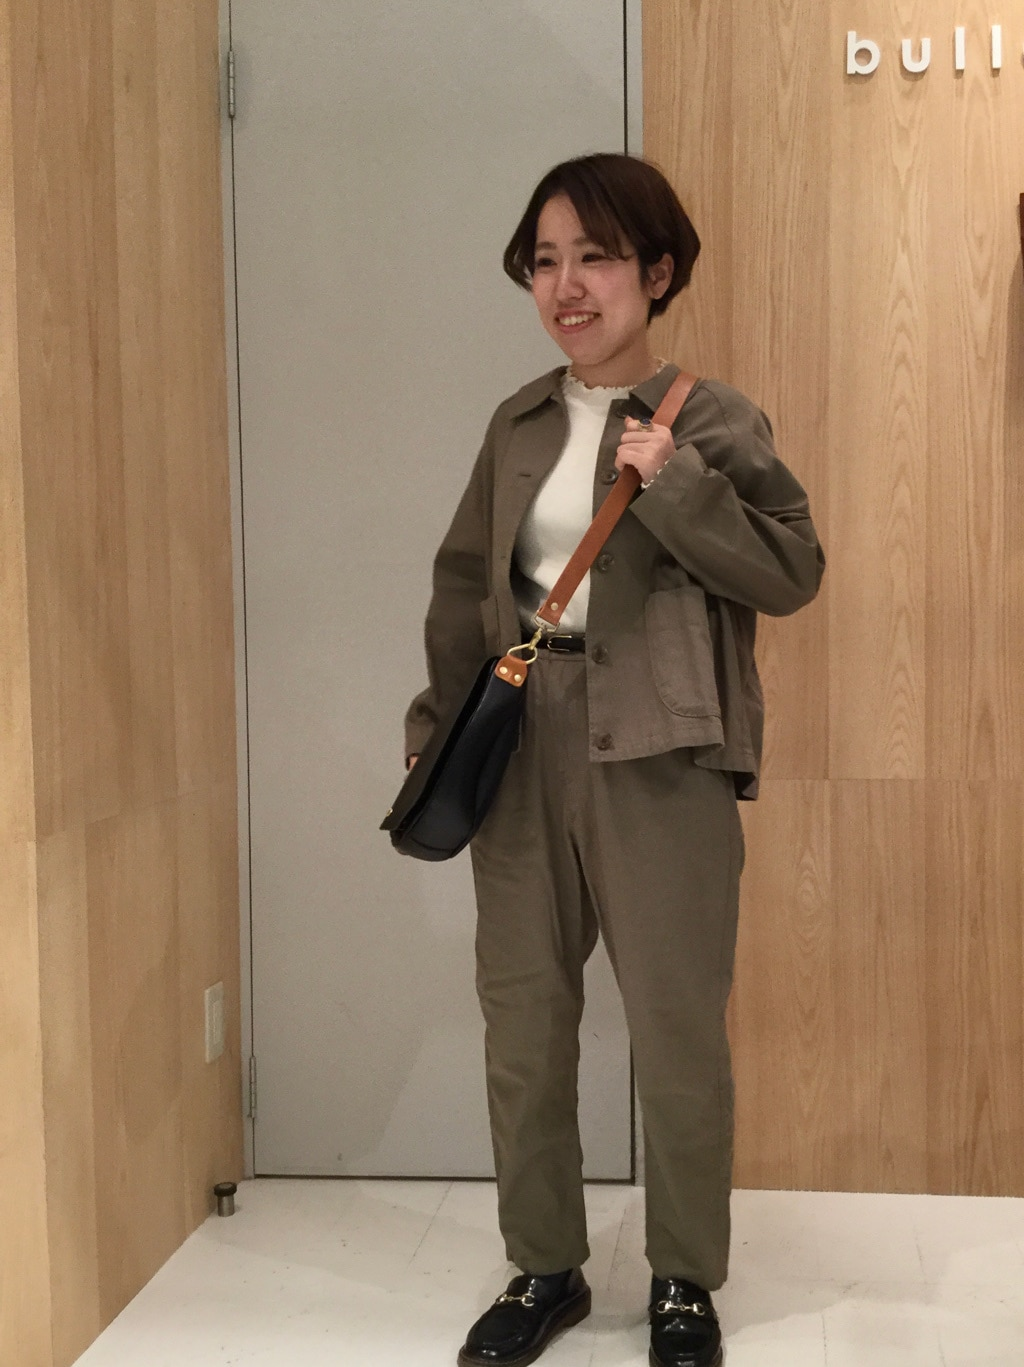 bulle de savon なんばシティ 身長:148cm 2020.02.28